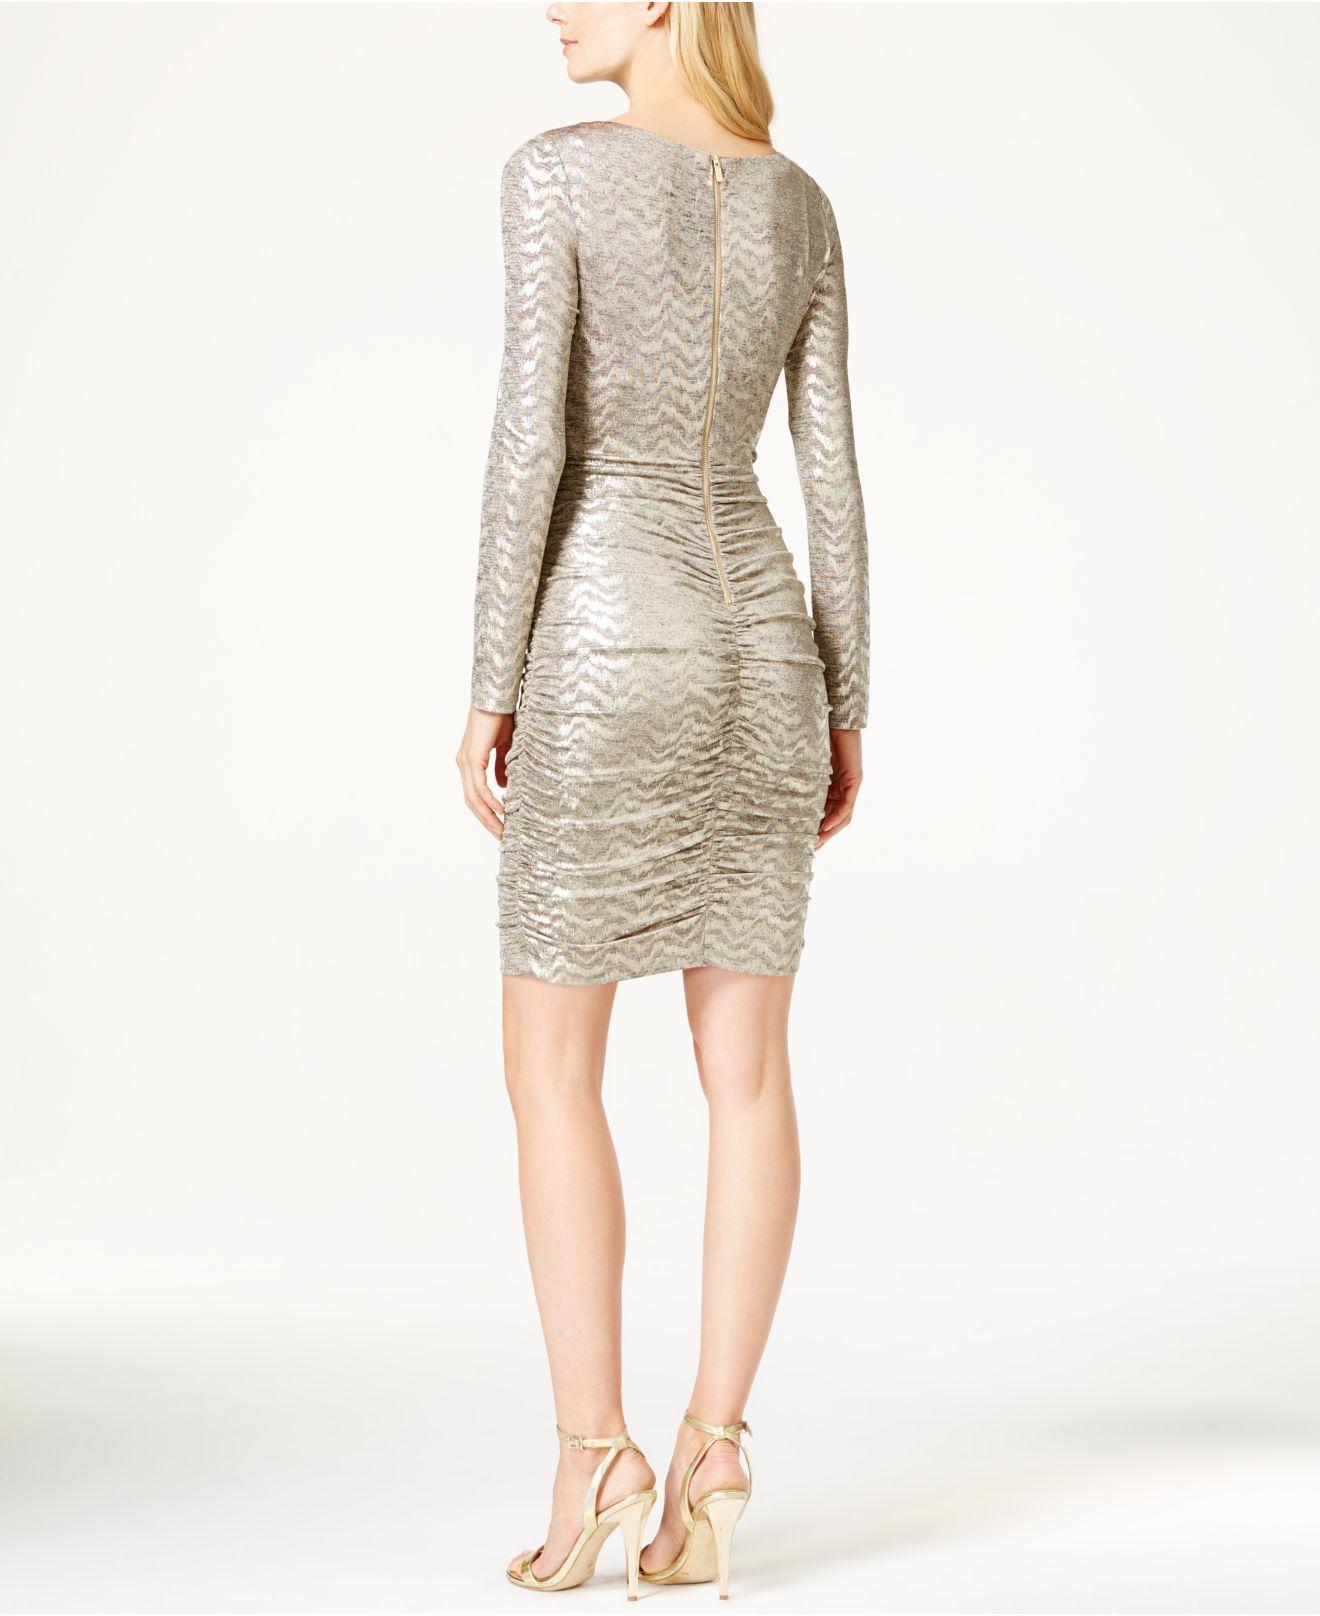 Vince camuto Metallic-knit Sheath Dress in Metallic | Lyst